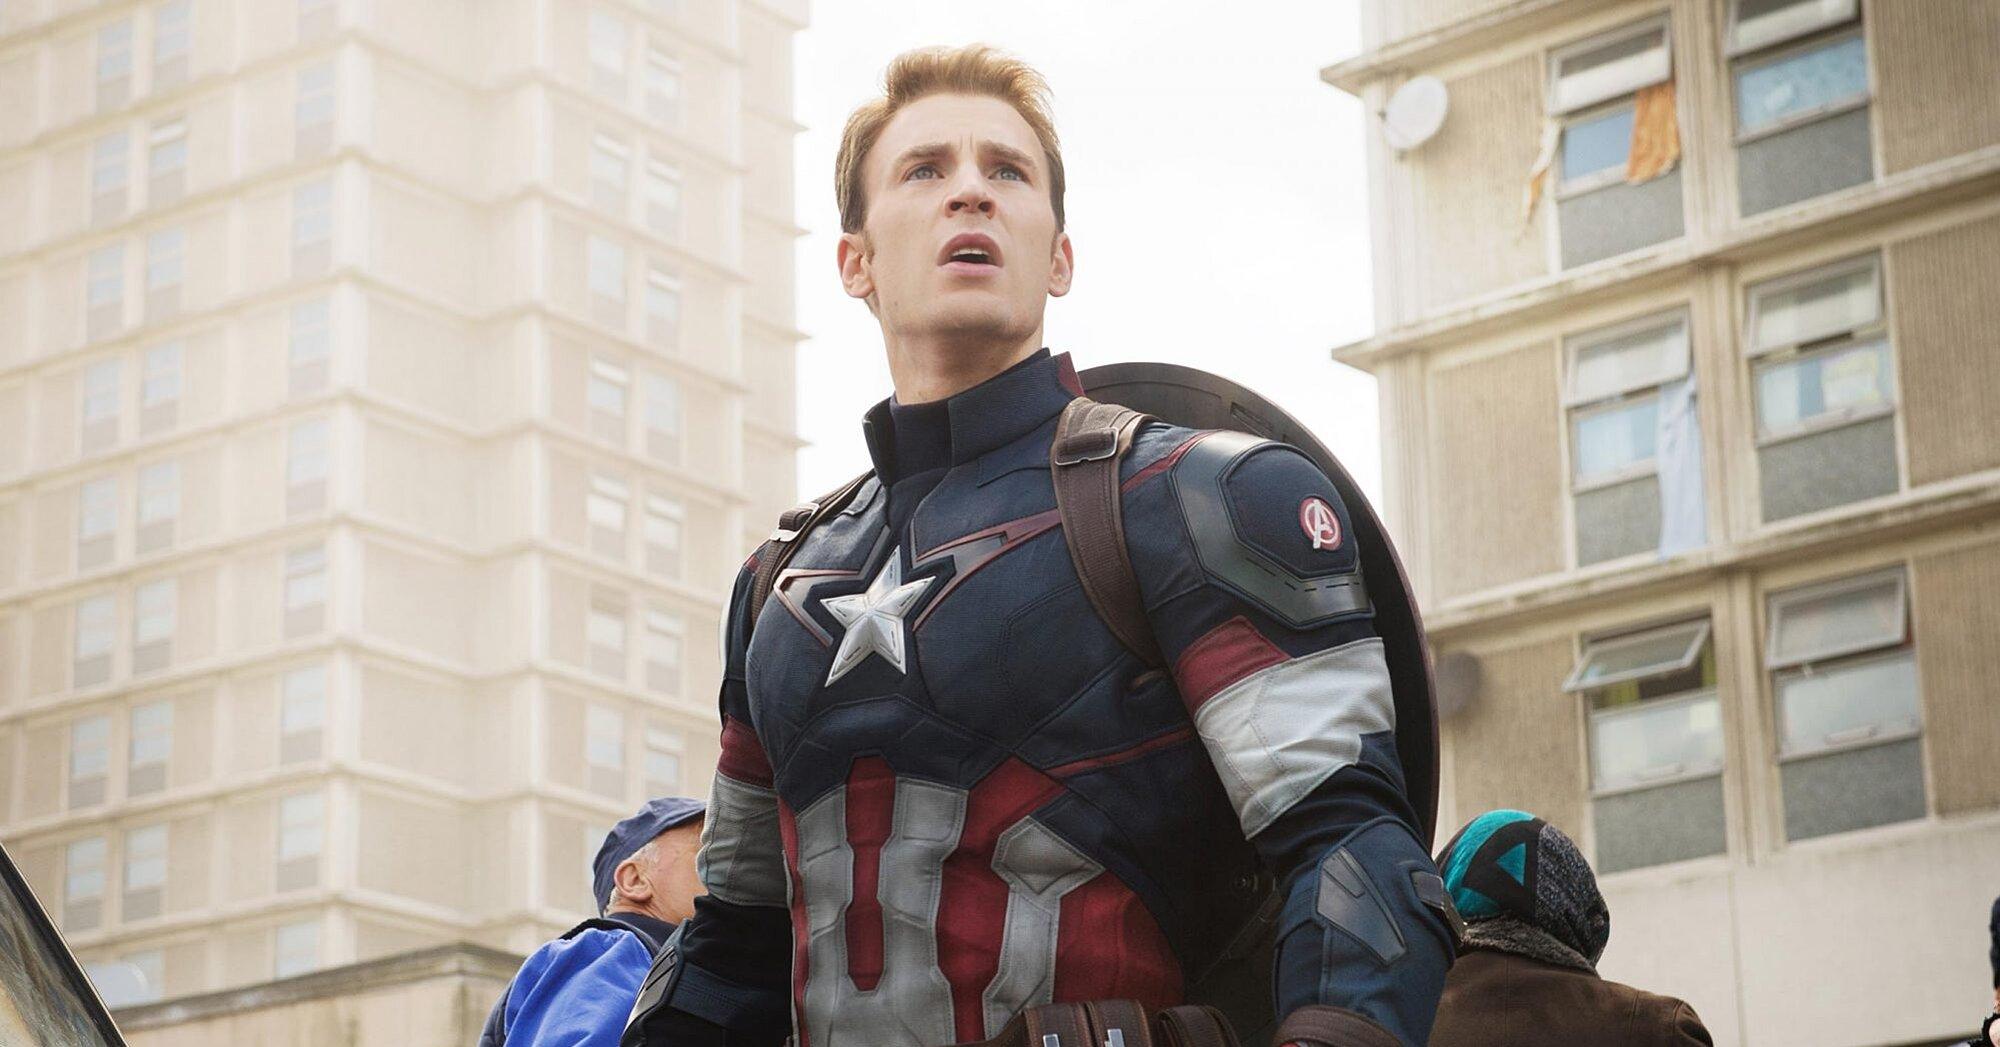 'Avengers Endgame' directors answer Captain America mystery